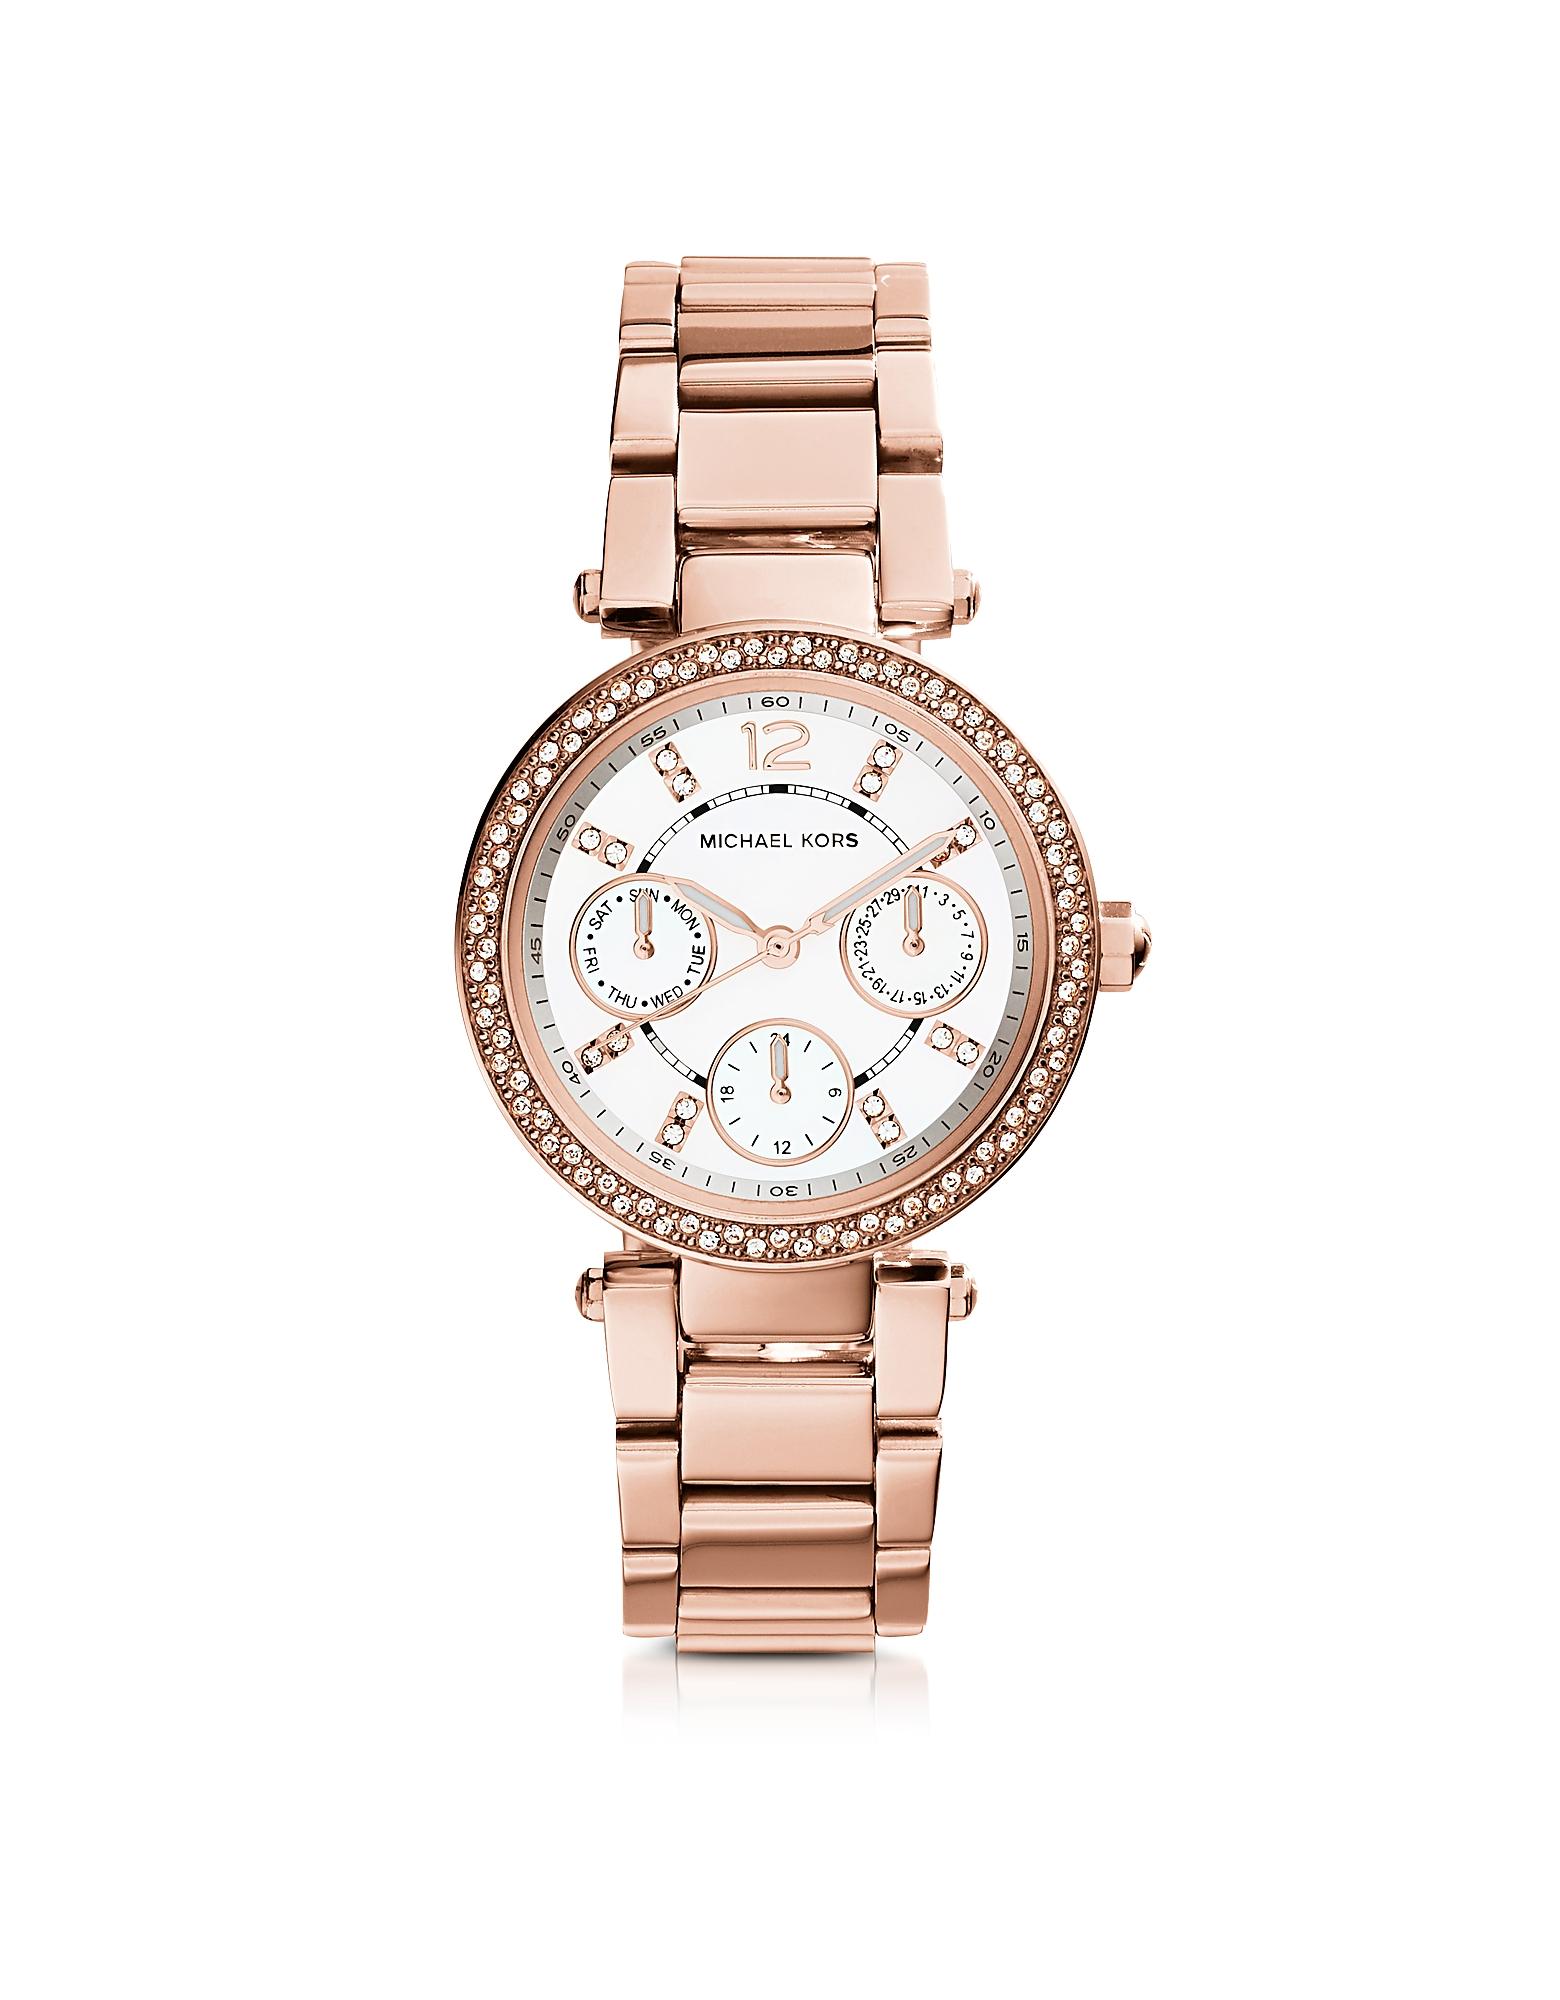 Michael Kors Women's Watches, Parker Stainless Steel Women's Watch